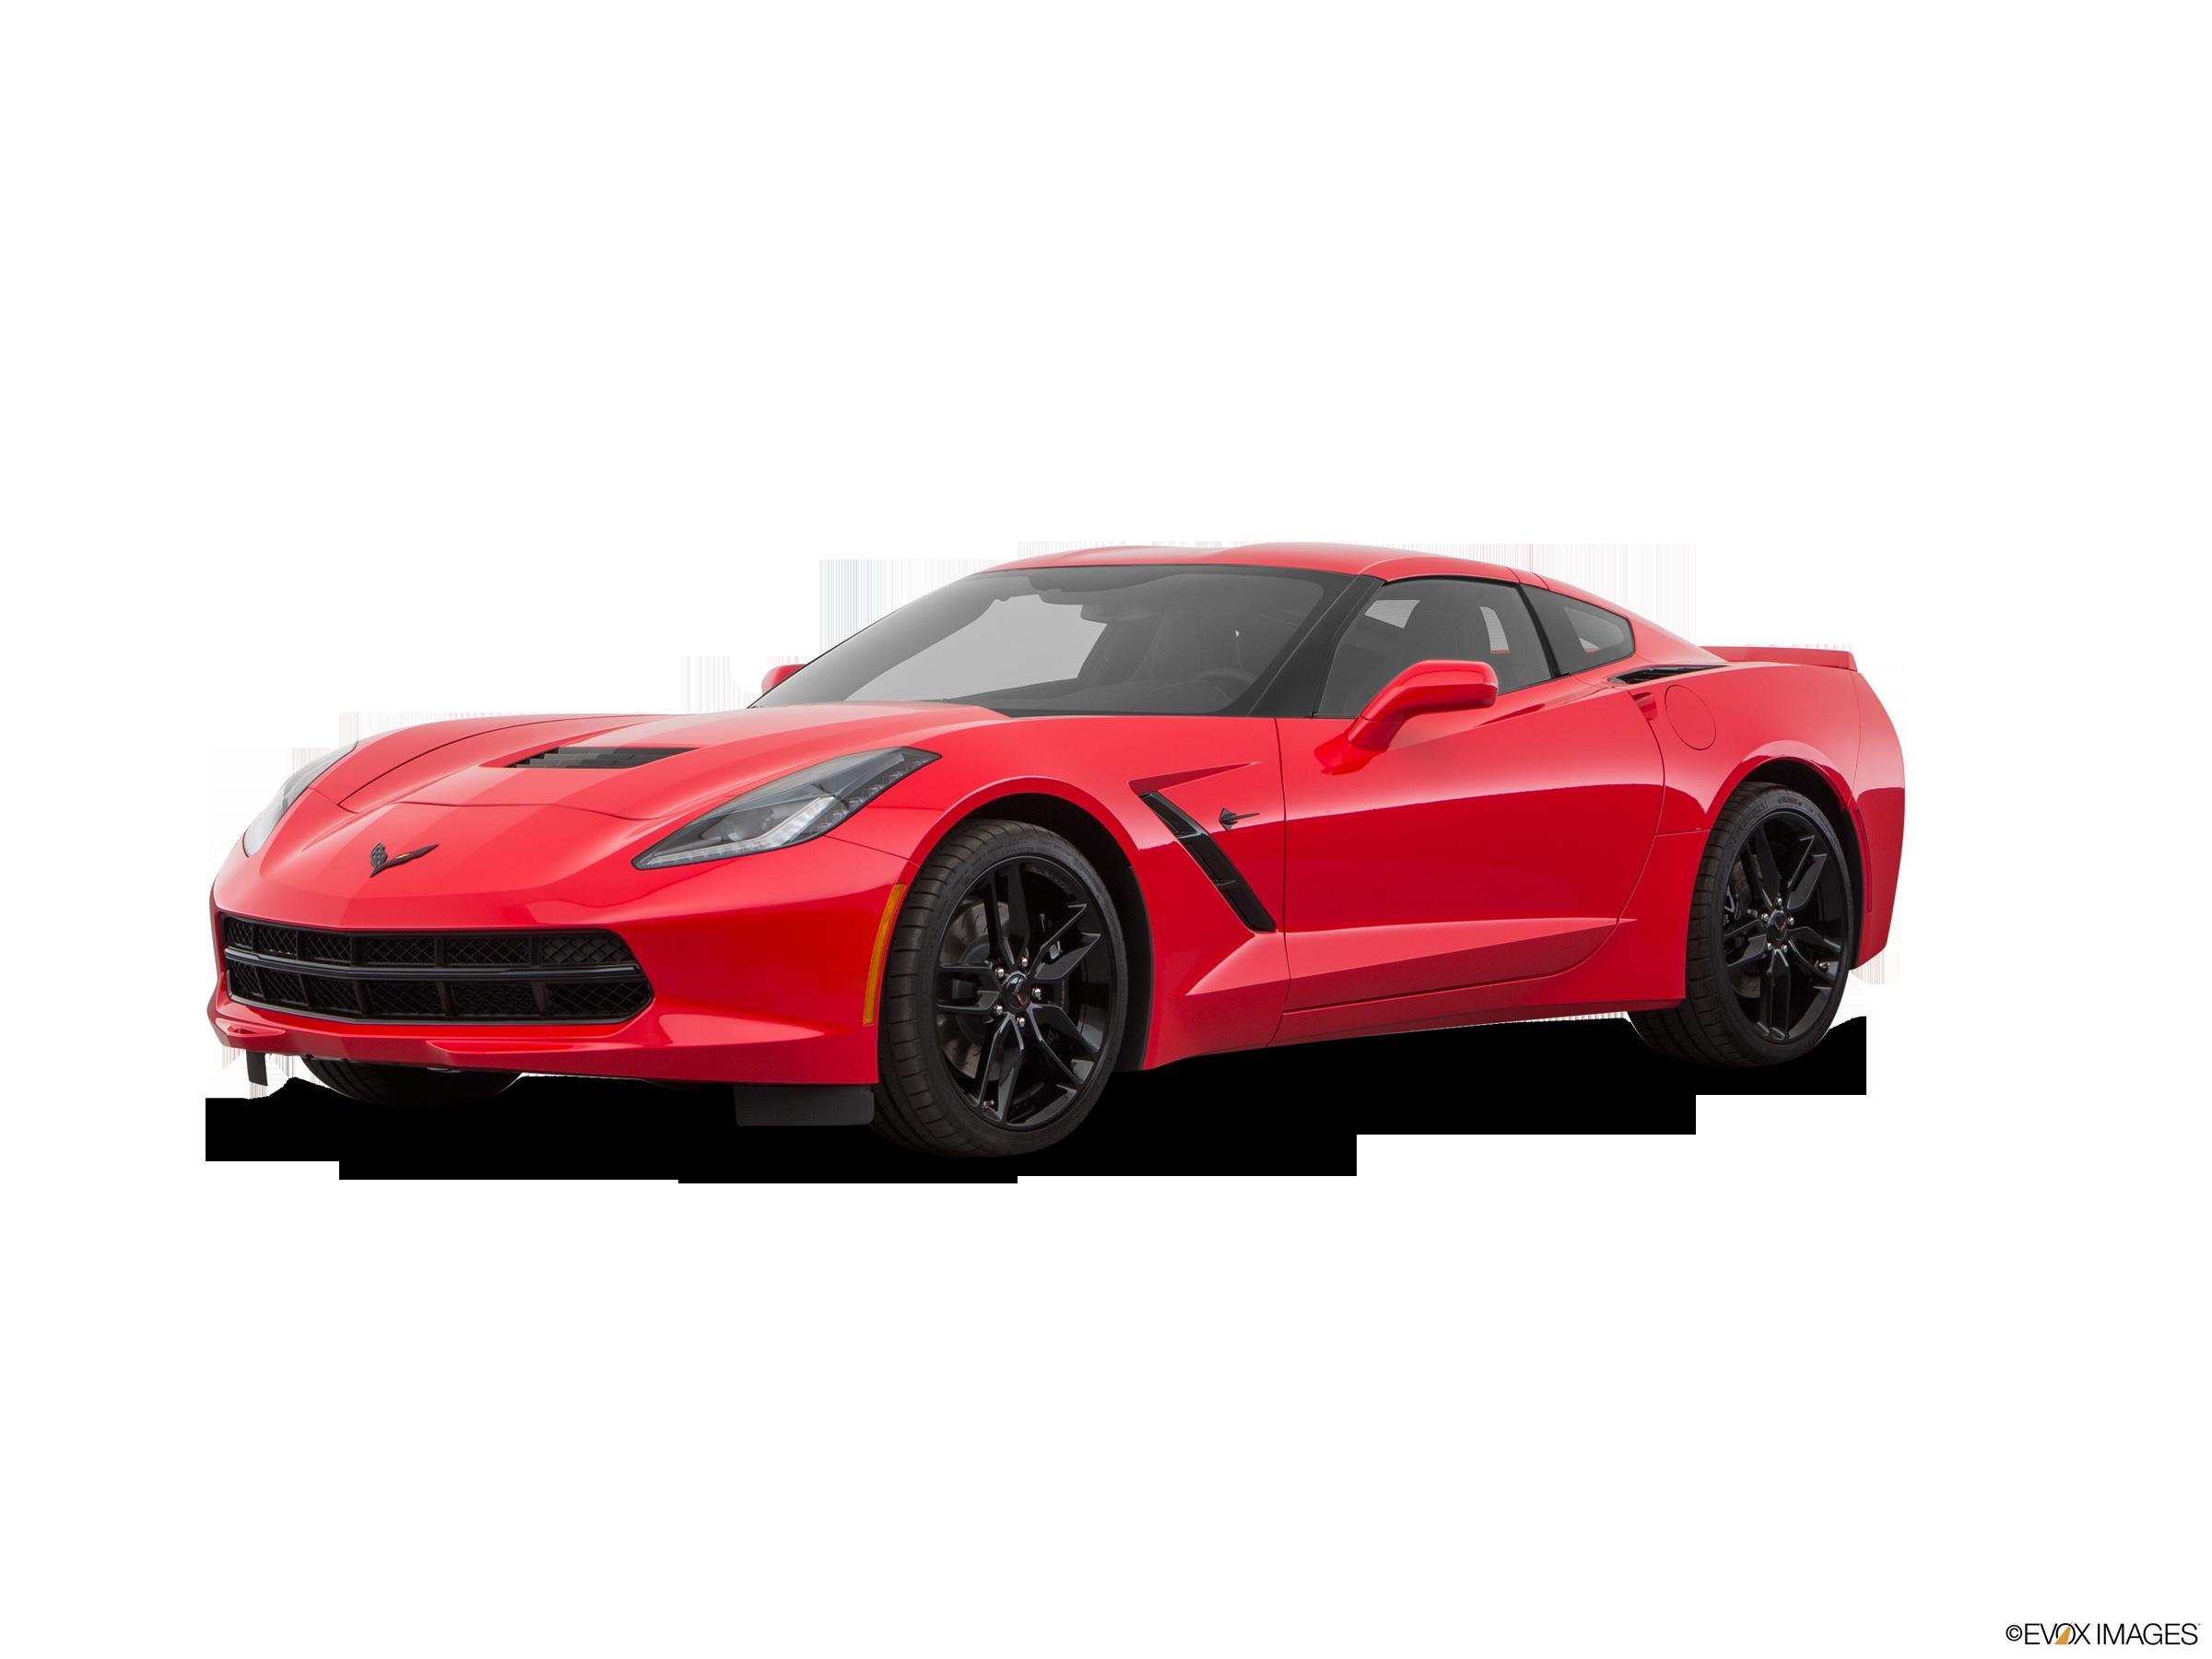 2019 Chevrolet Corvette Pricing Reviews Ratings Kelley